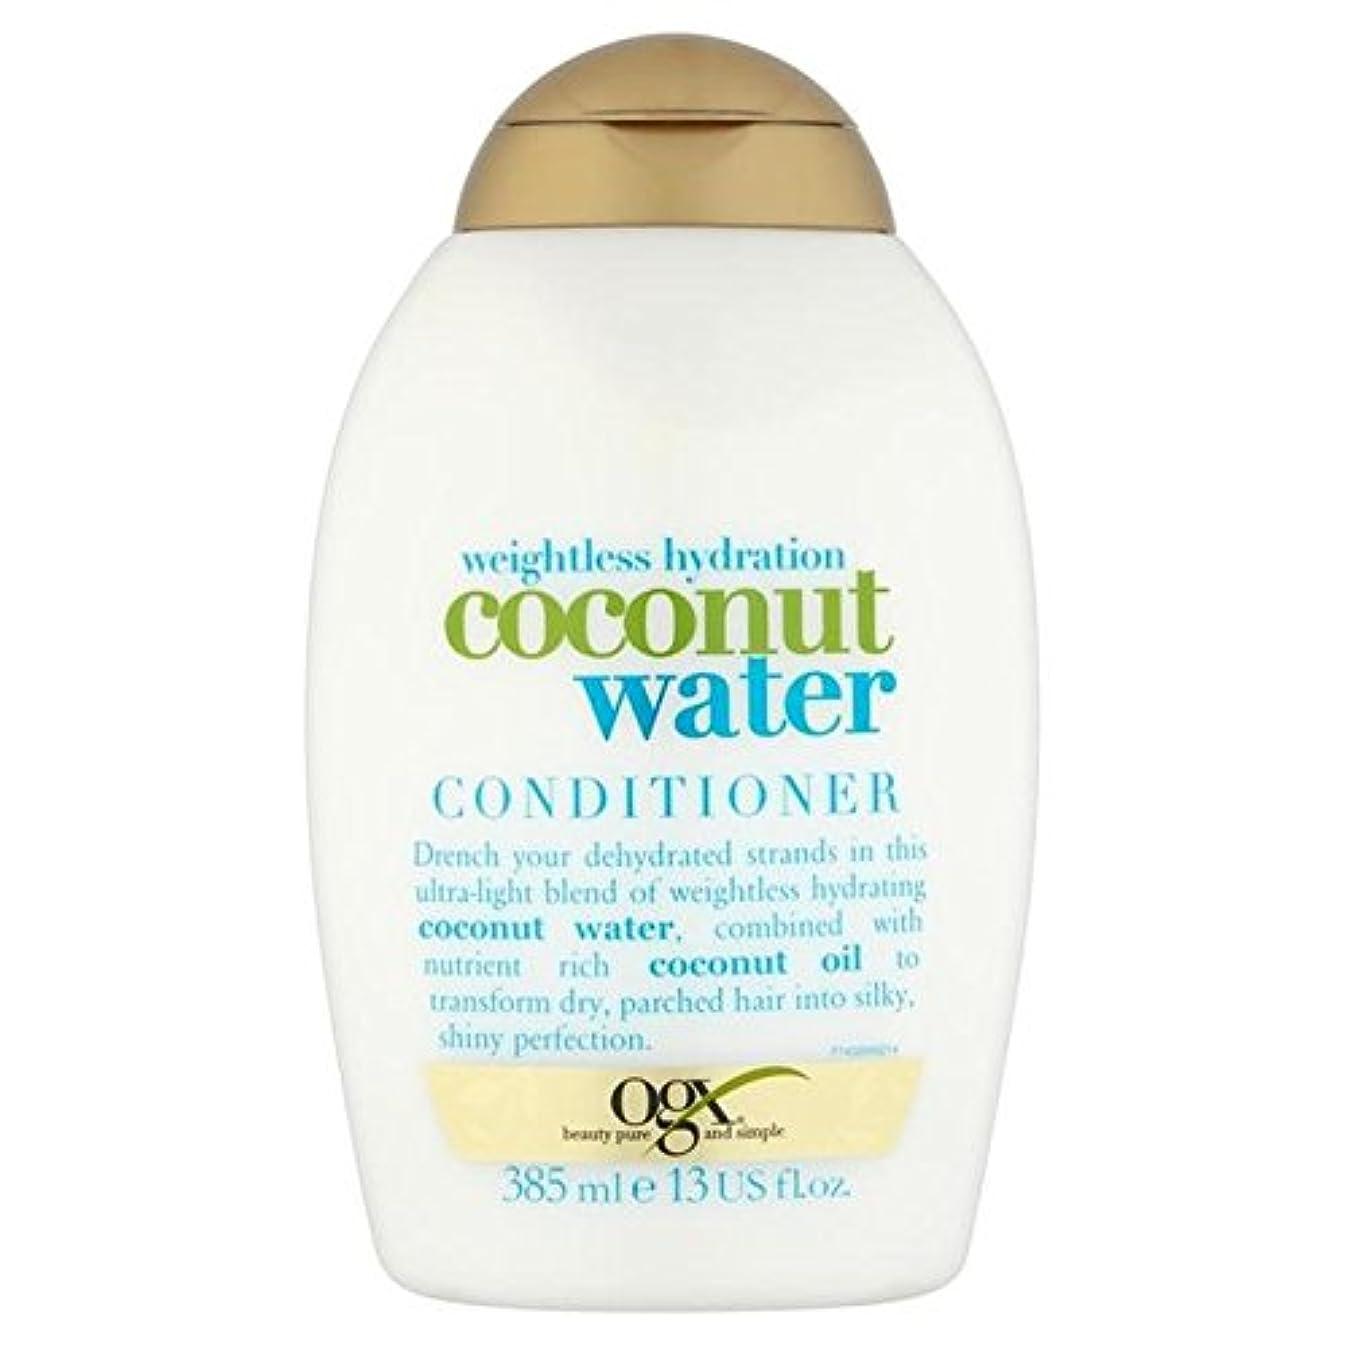 Ogx Coconut Water Conditioner 385ml (Pack of 6) - ココナッツ水コンディショナー385ミリリットル x6 [並行輸入品]